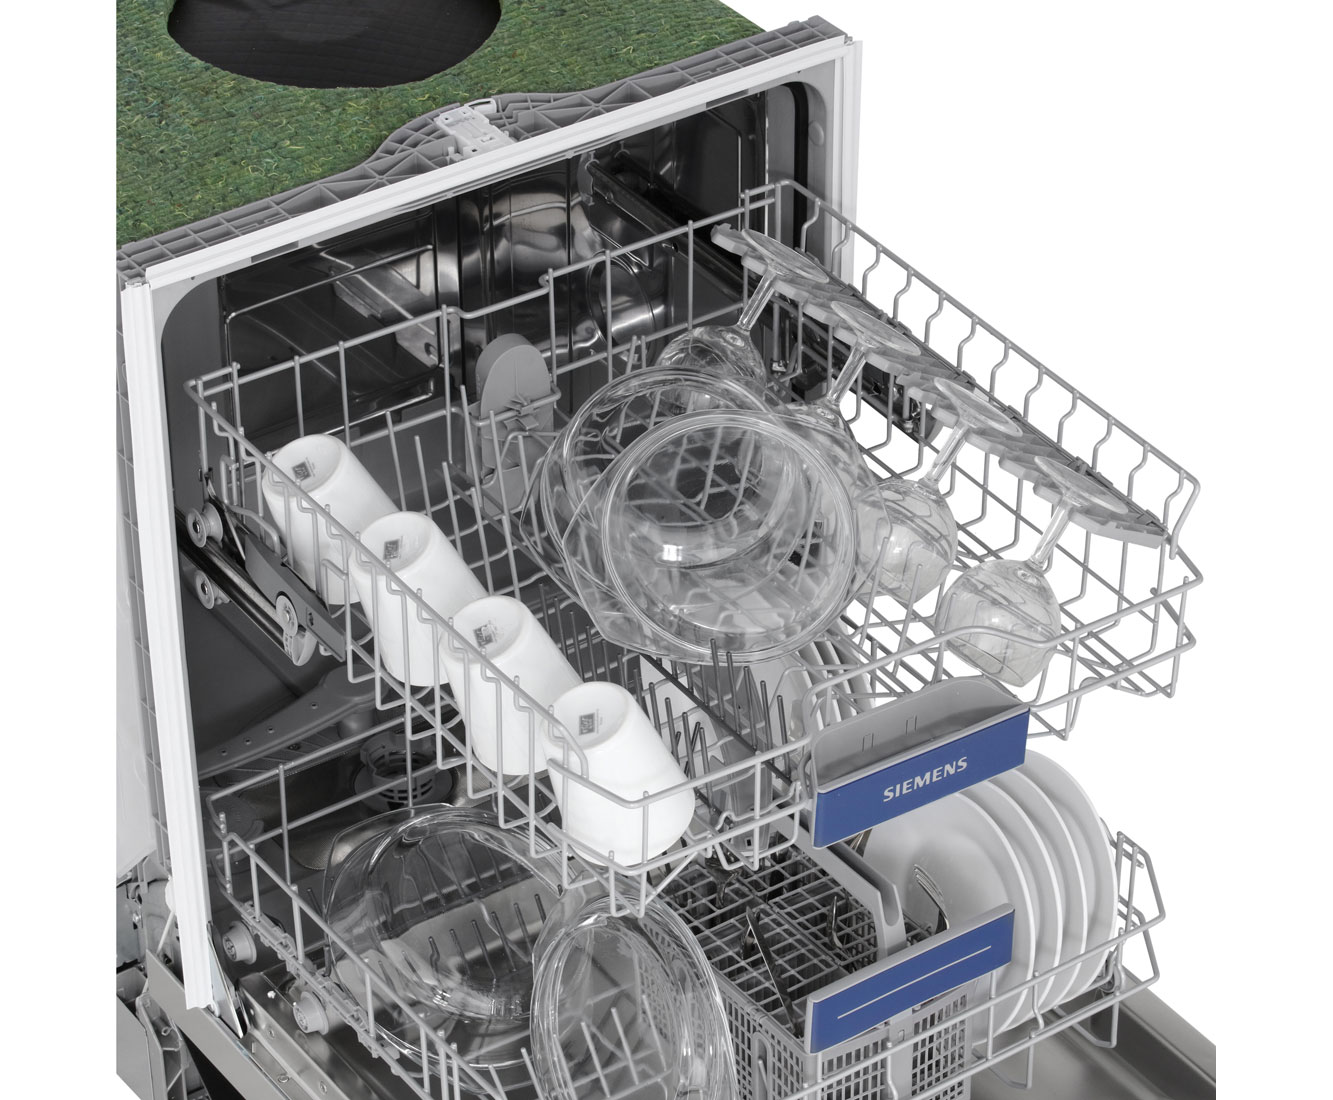 Siemens Geschirrspüler Sn 636 X 00 Ge Vollintegrierbare